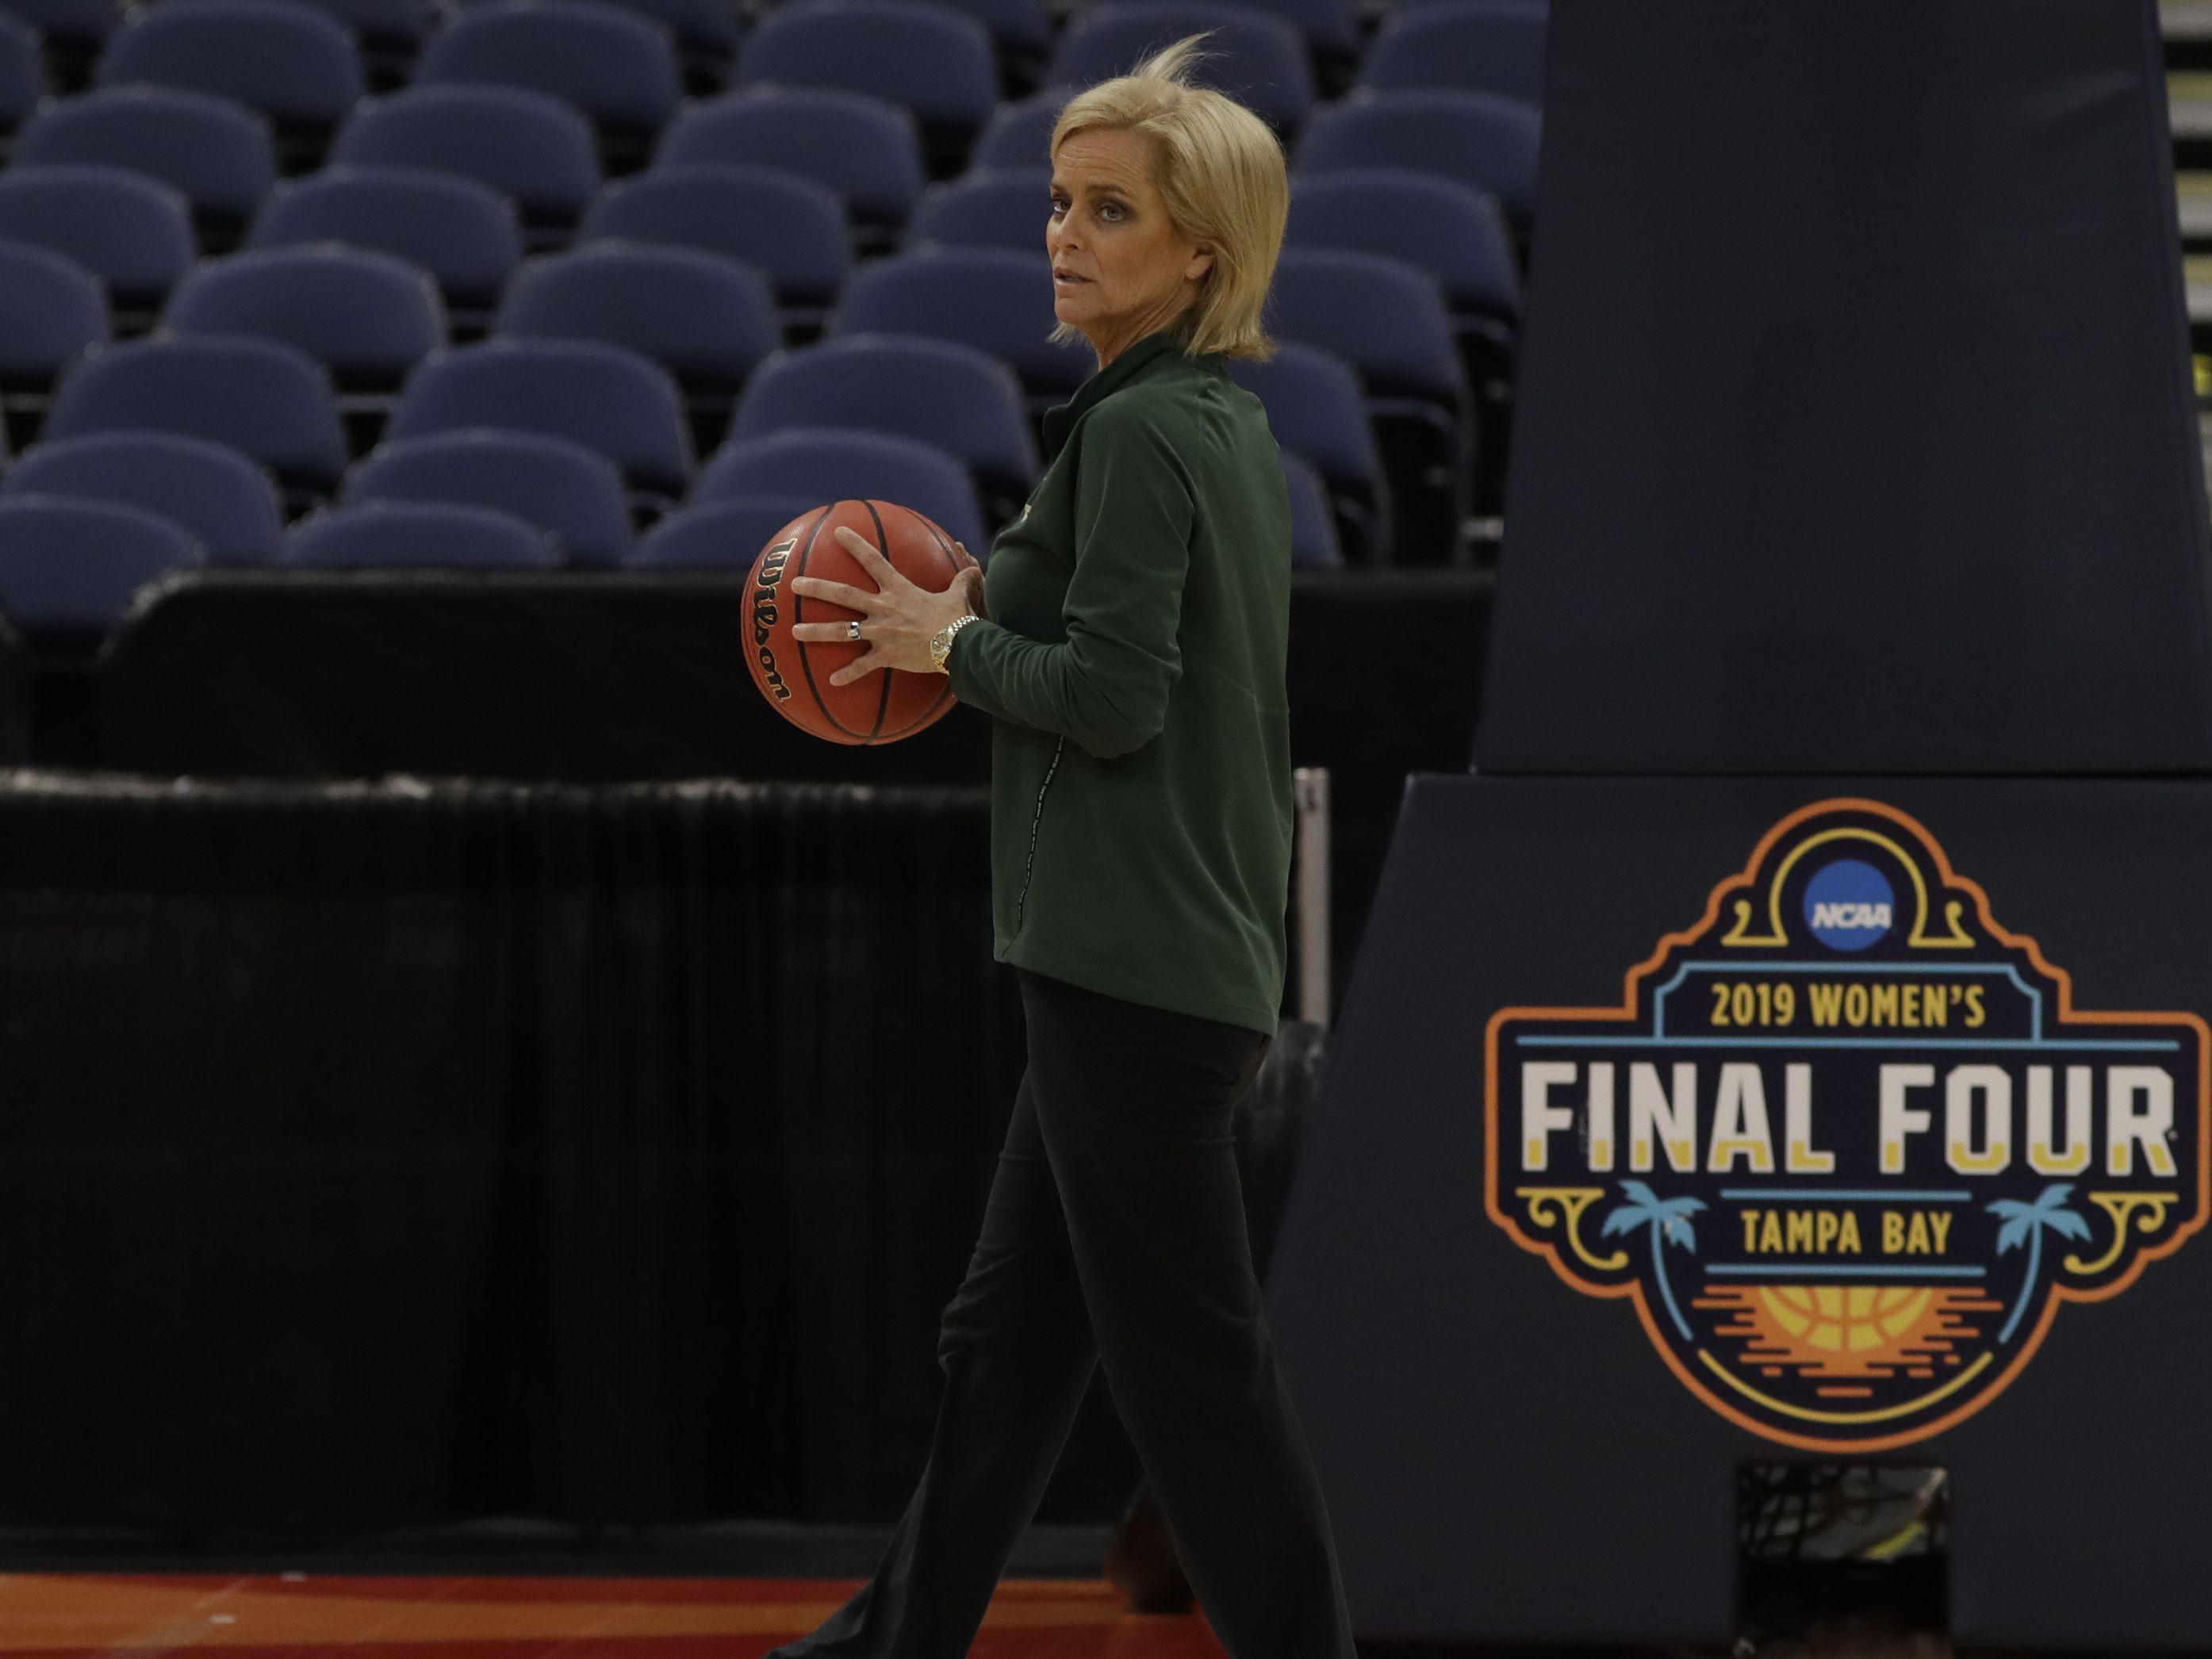 NCAA women's championship: Heroic Chloe Jackson lifts Baylor over Notre Dame